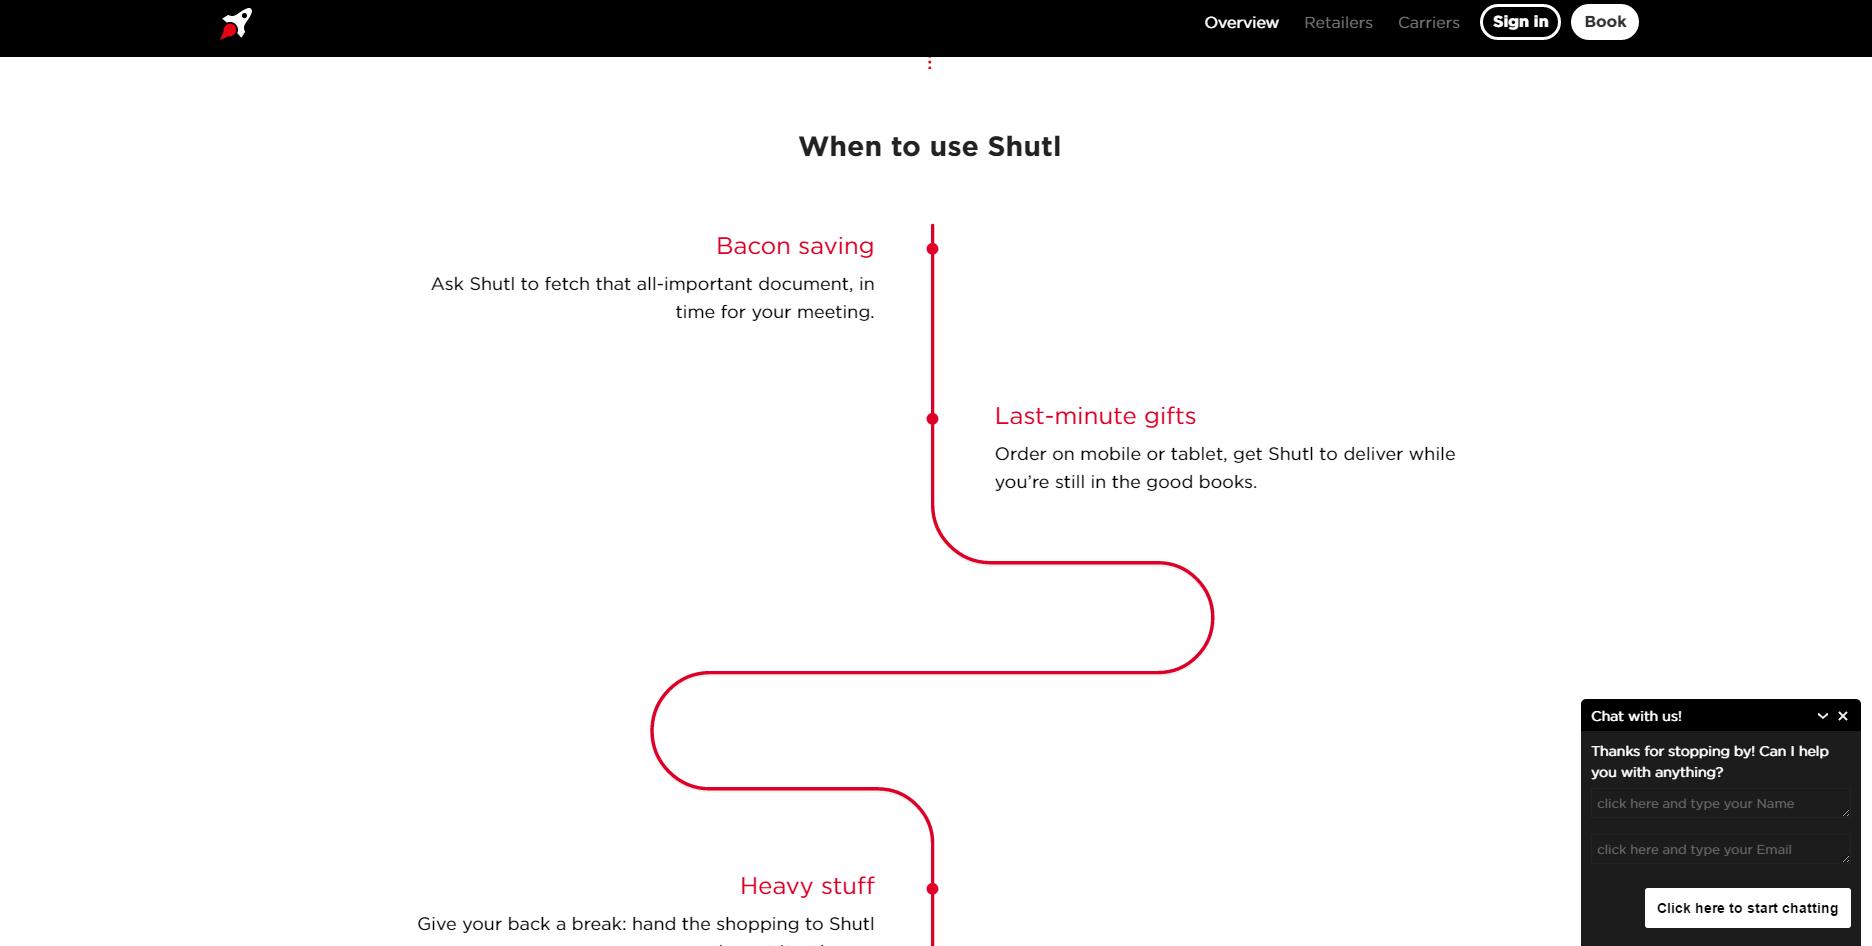 shutl-whitespace-example.png